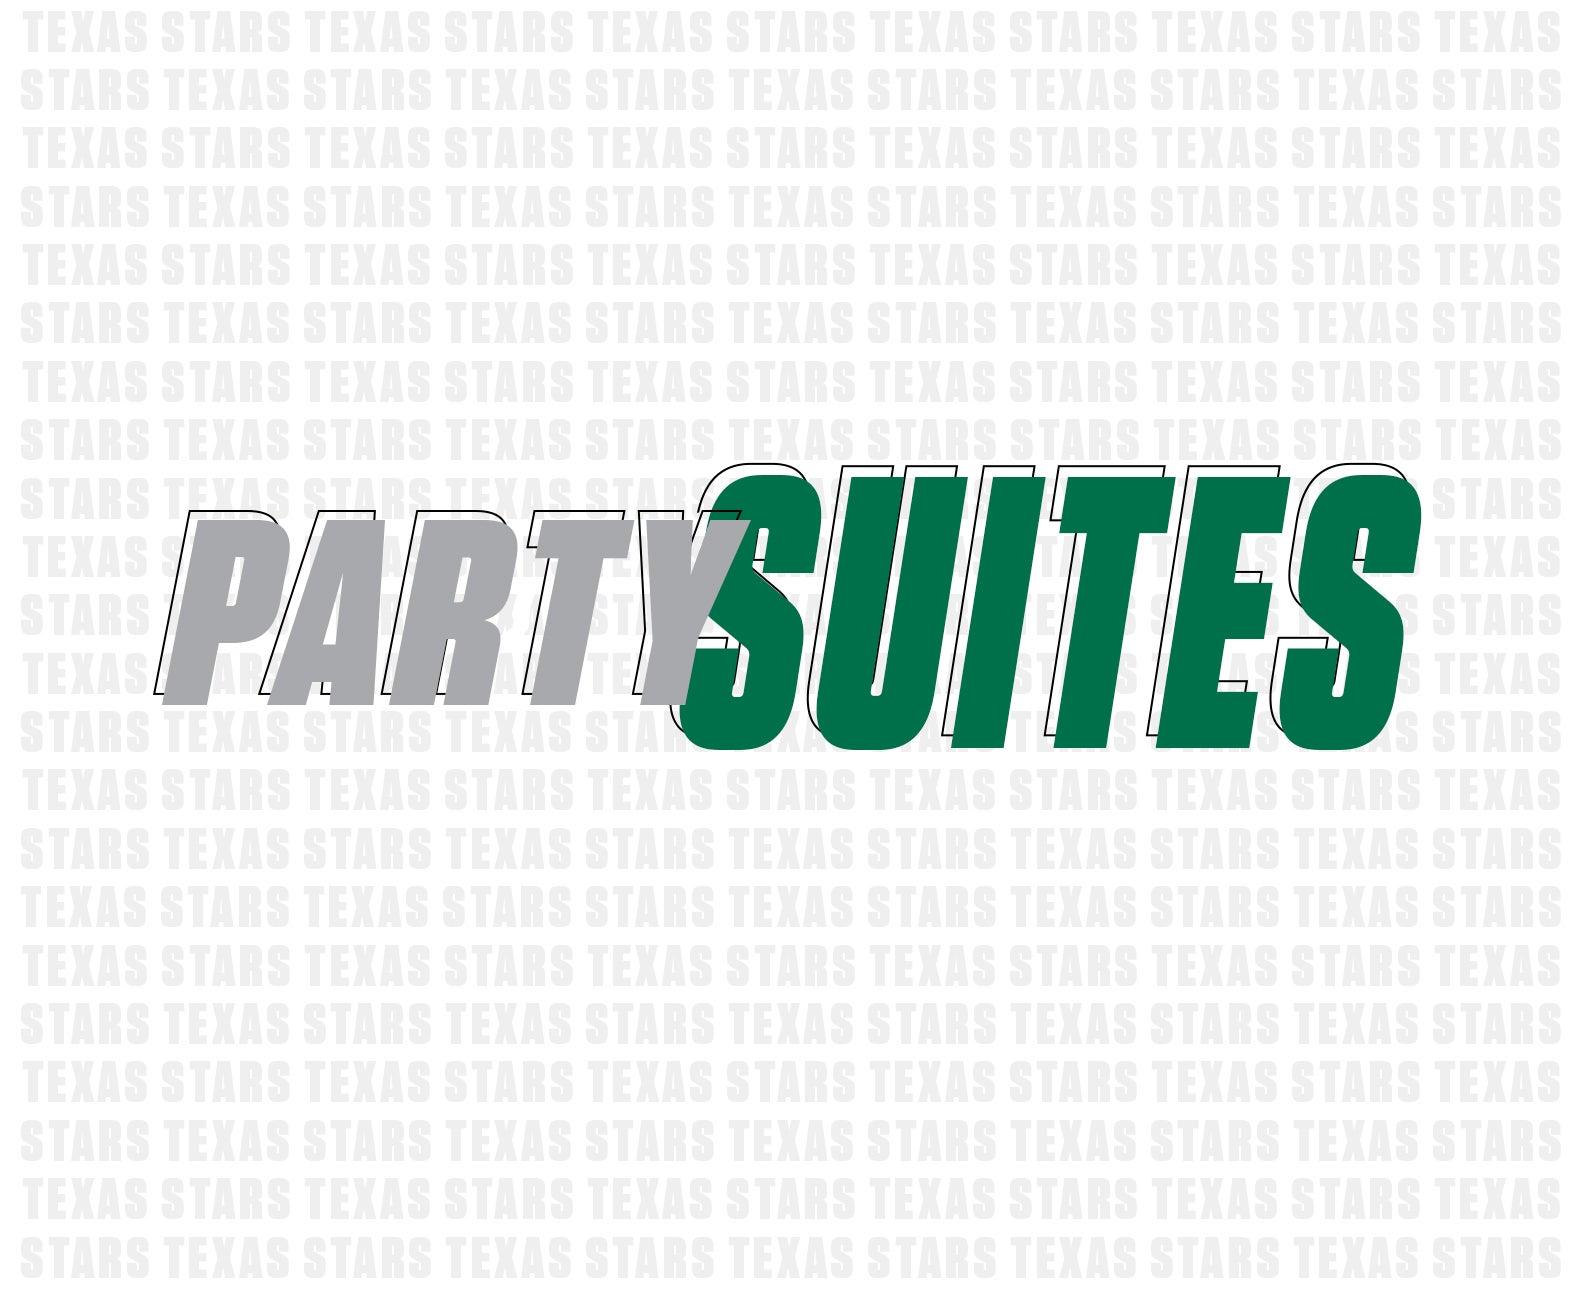 2122WebsiteButtons-PartySuite.jpg